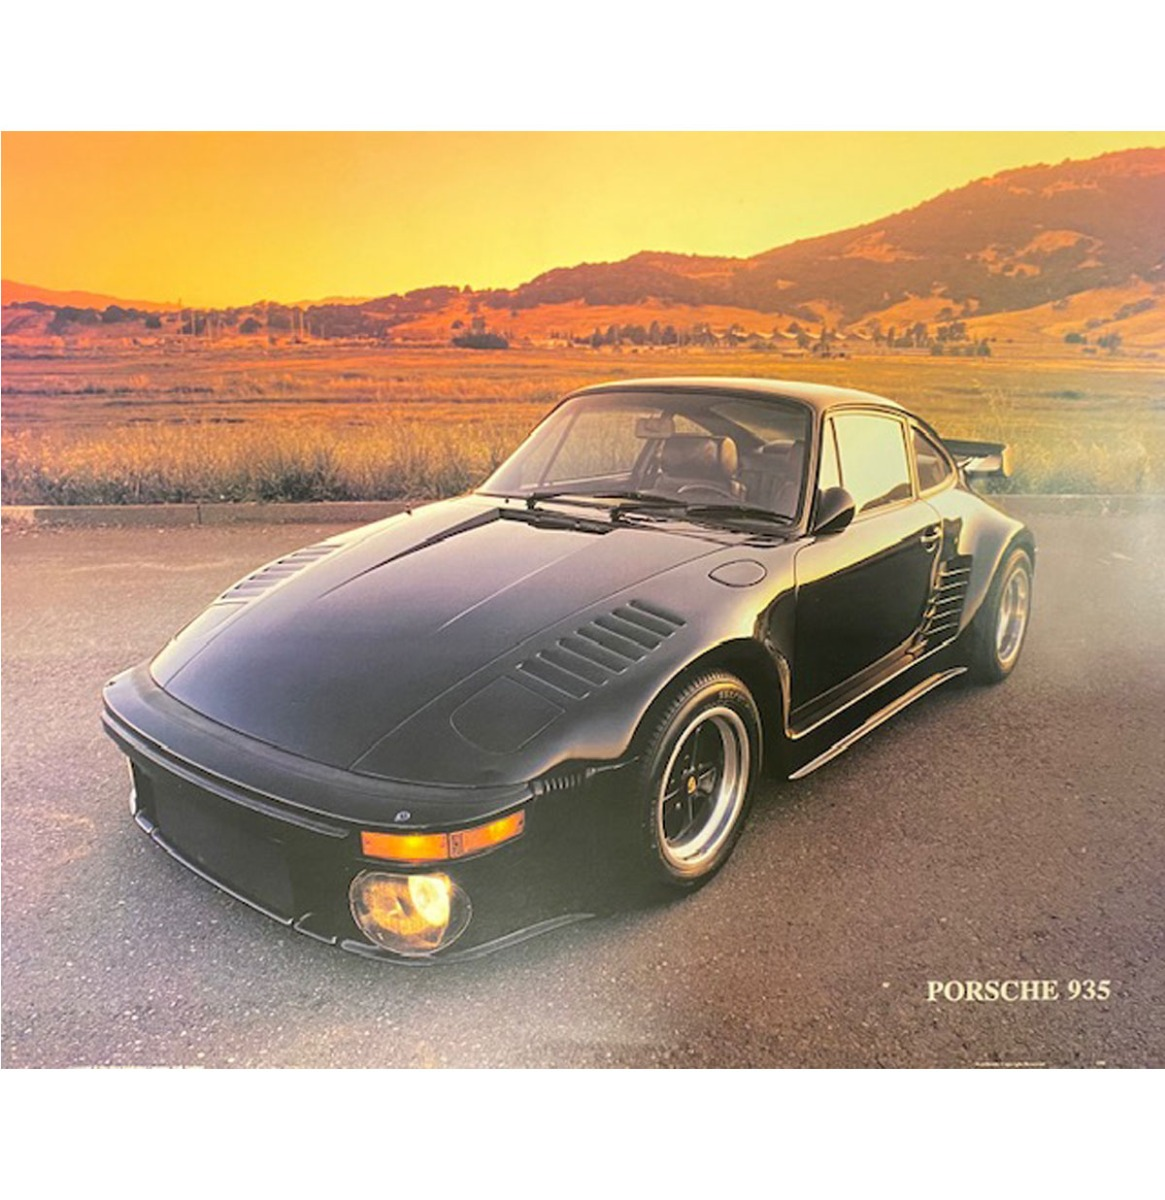 Auto Poster Porsche 935 40x50cm